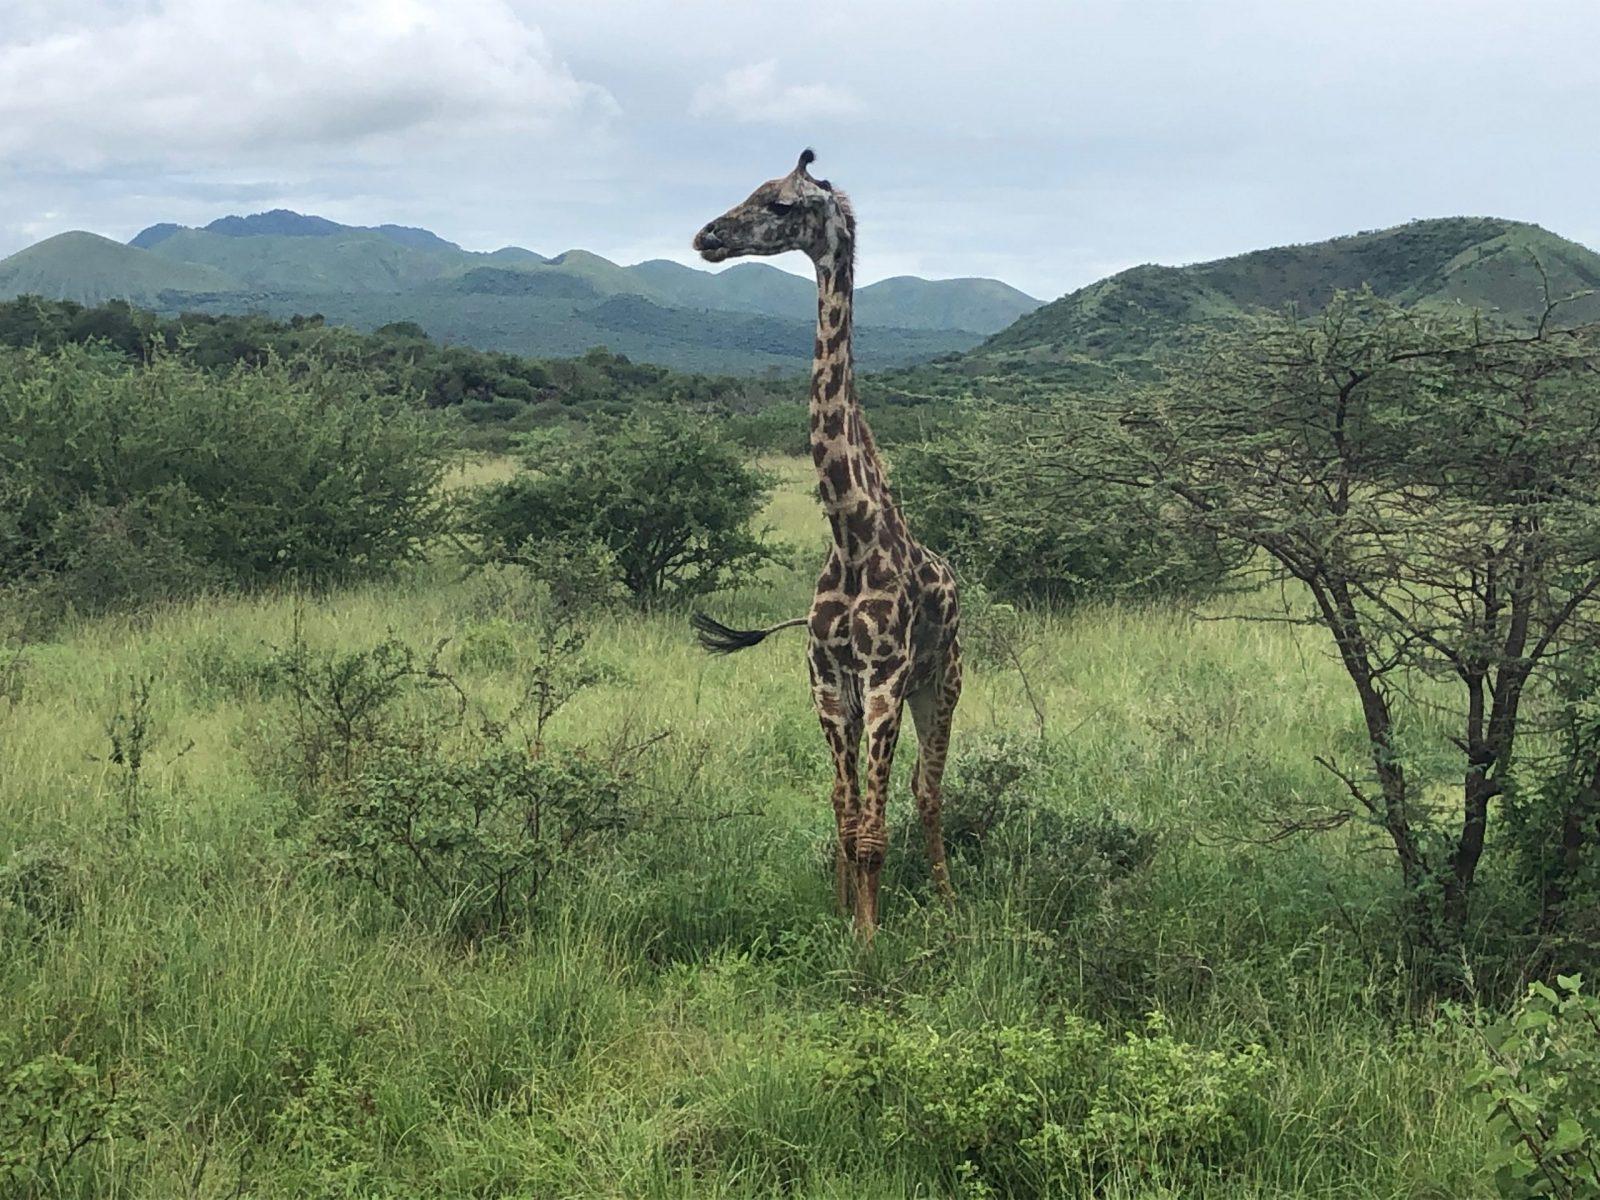 Za horyzont| Kenia i Tanzania na spontanie